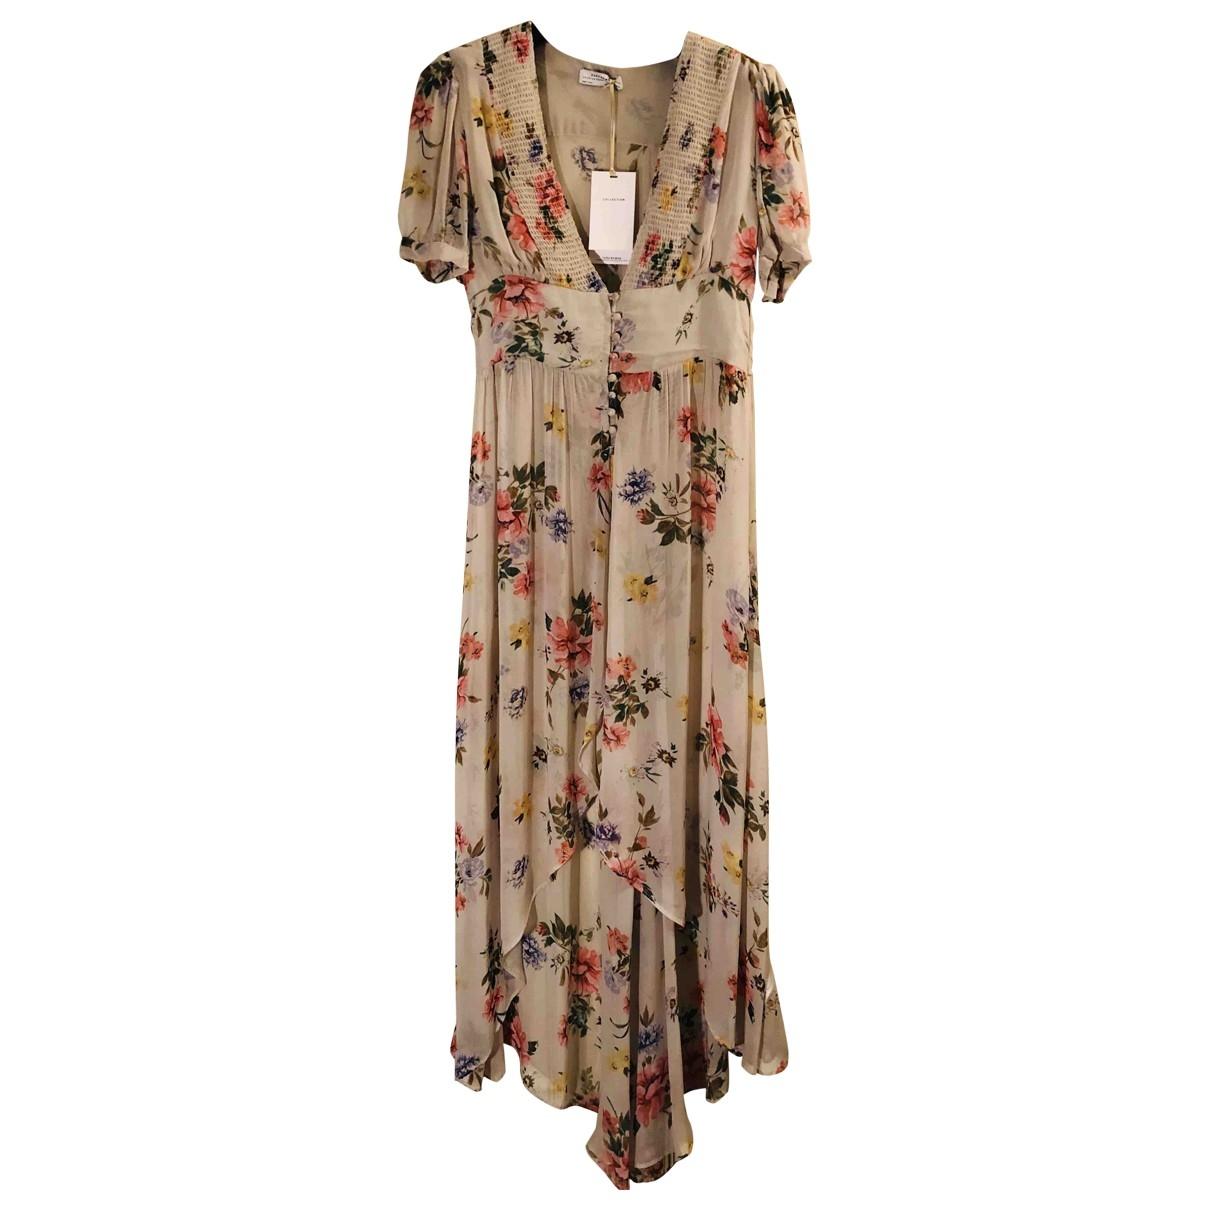 Zara \N Kleid in  Ecru Polyester